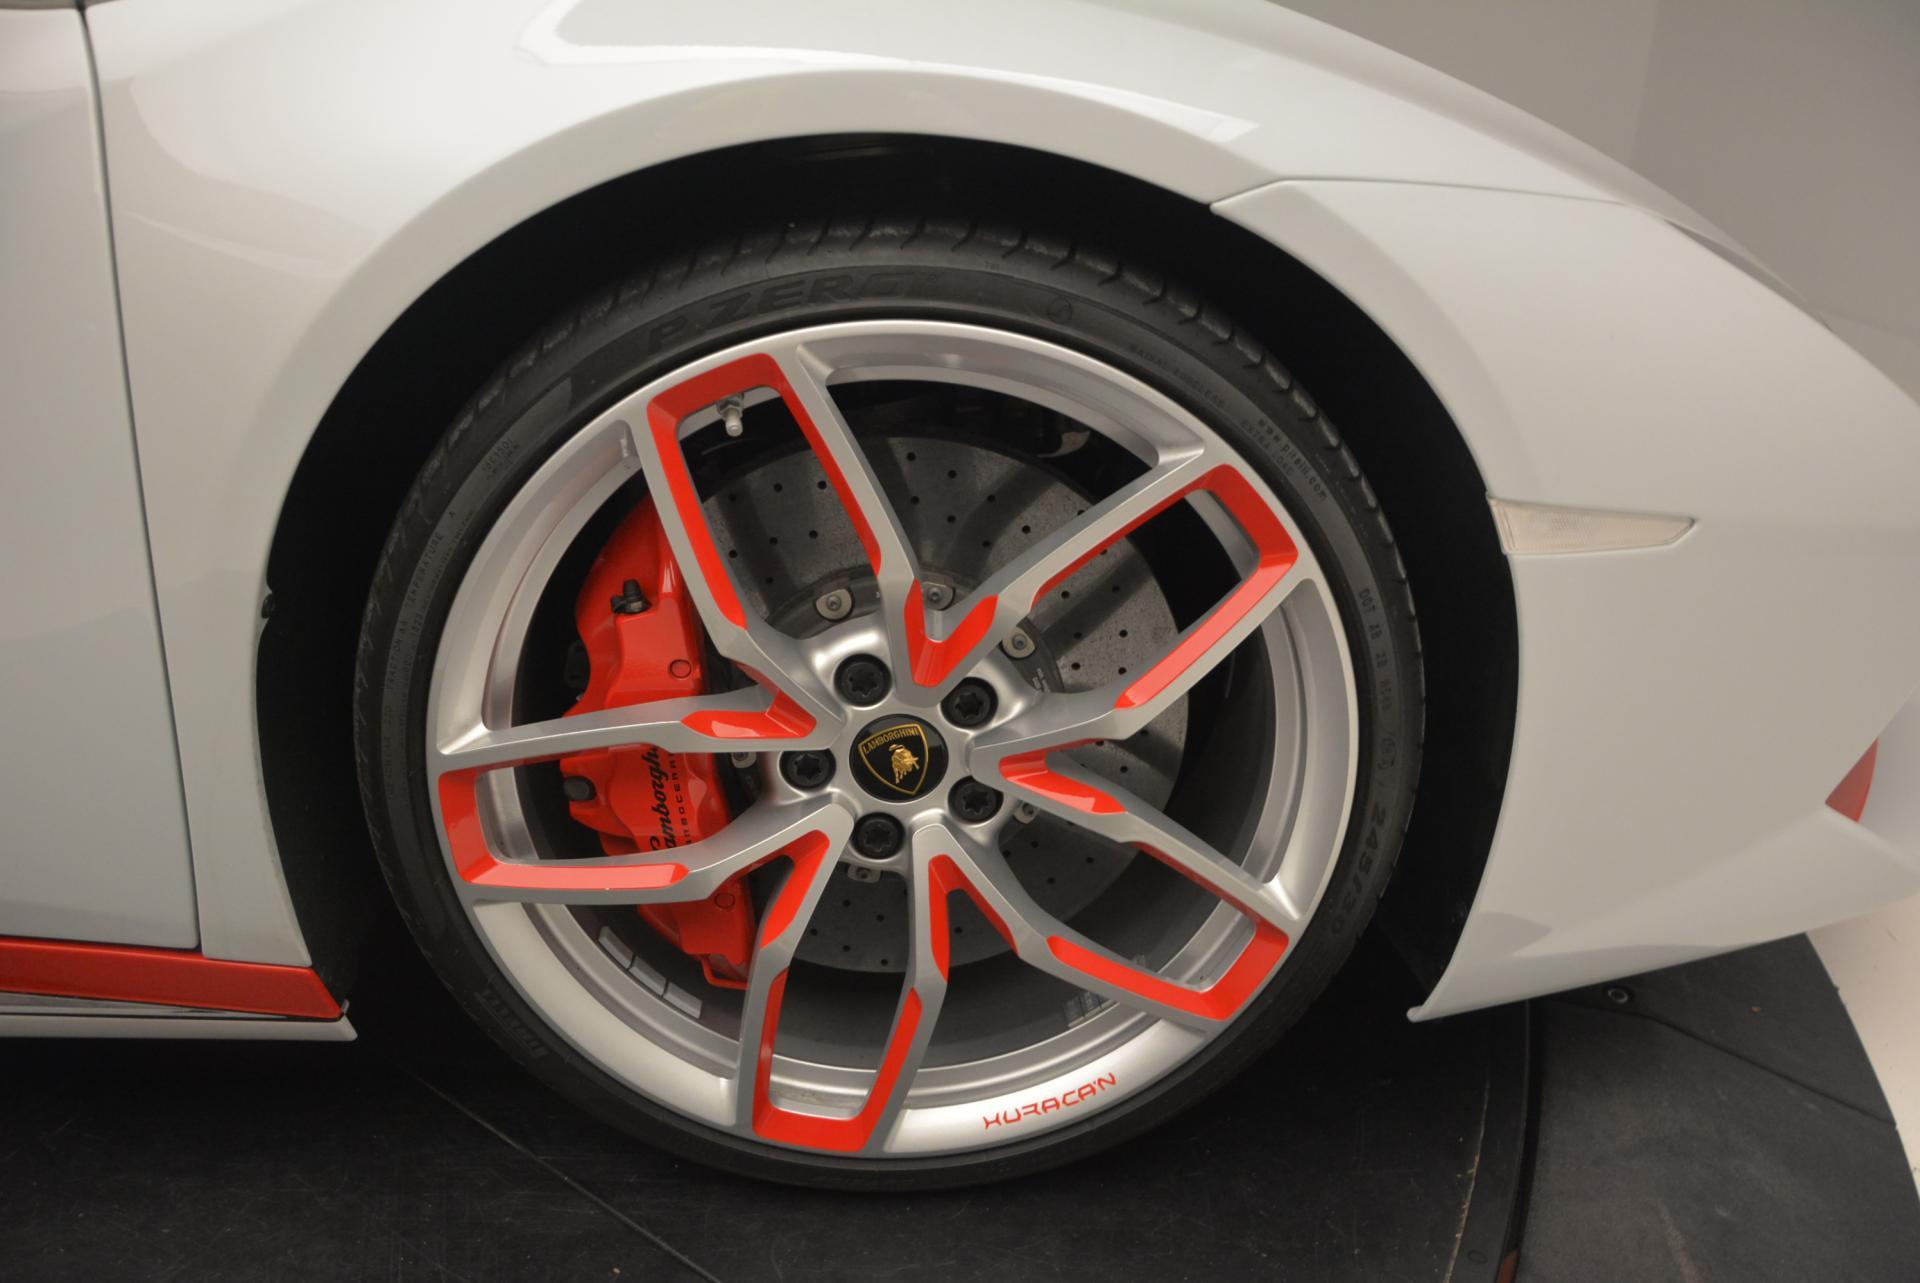 Used 2015 Lamborghini Huracan LP610-4 For Sale In Greenwich, CT. Alfa Romeo of Greenwich, F1707A 114_p21